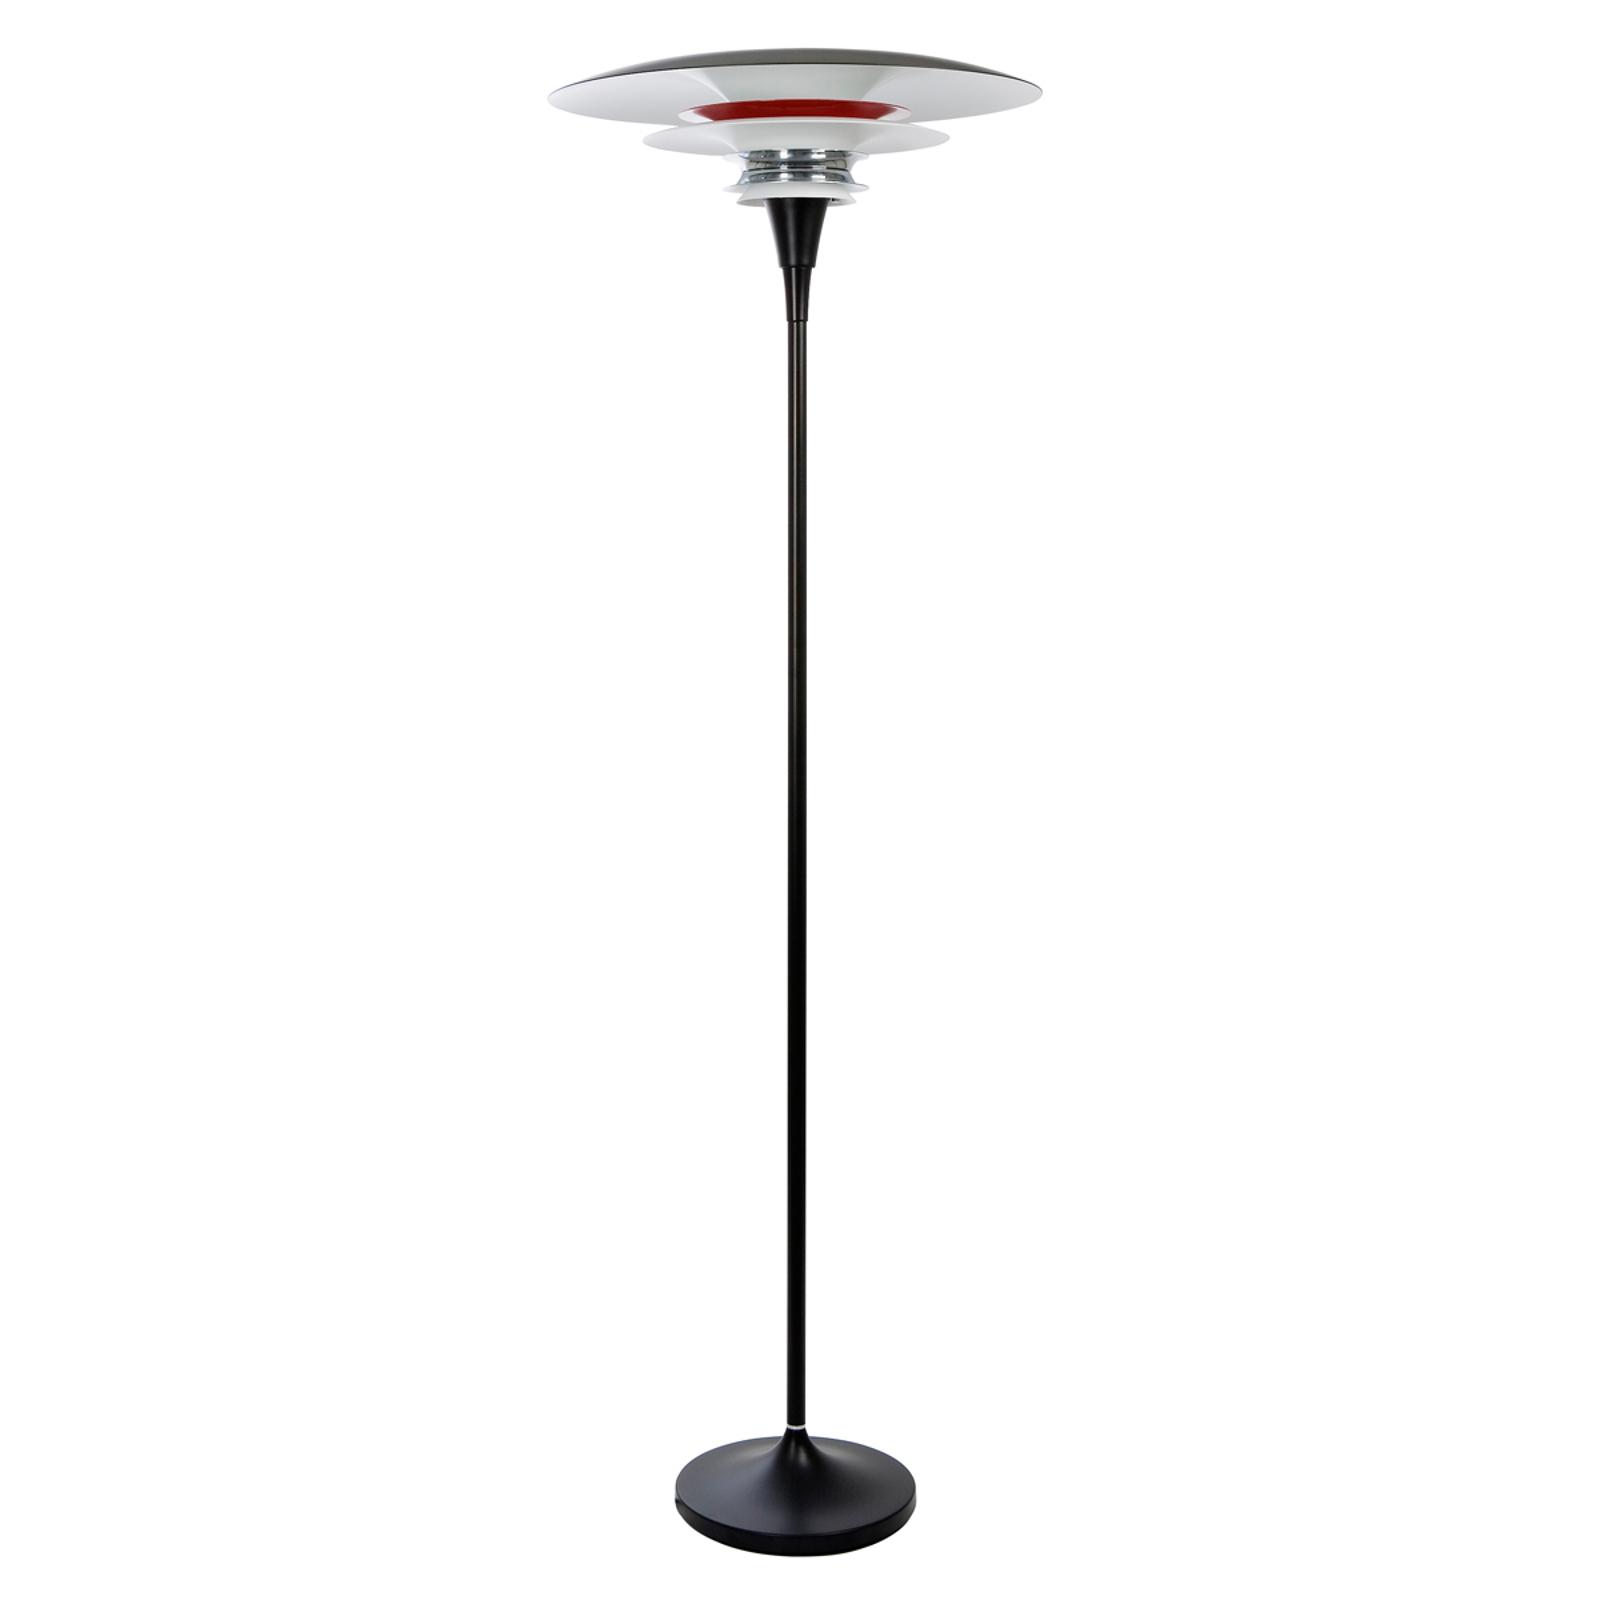 Diablo gulvlampe, sort rød - integreret lysdæmper